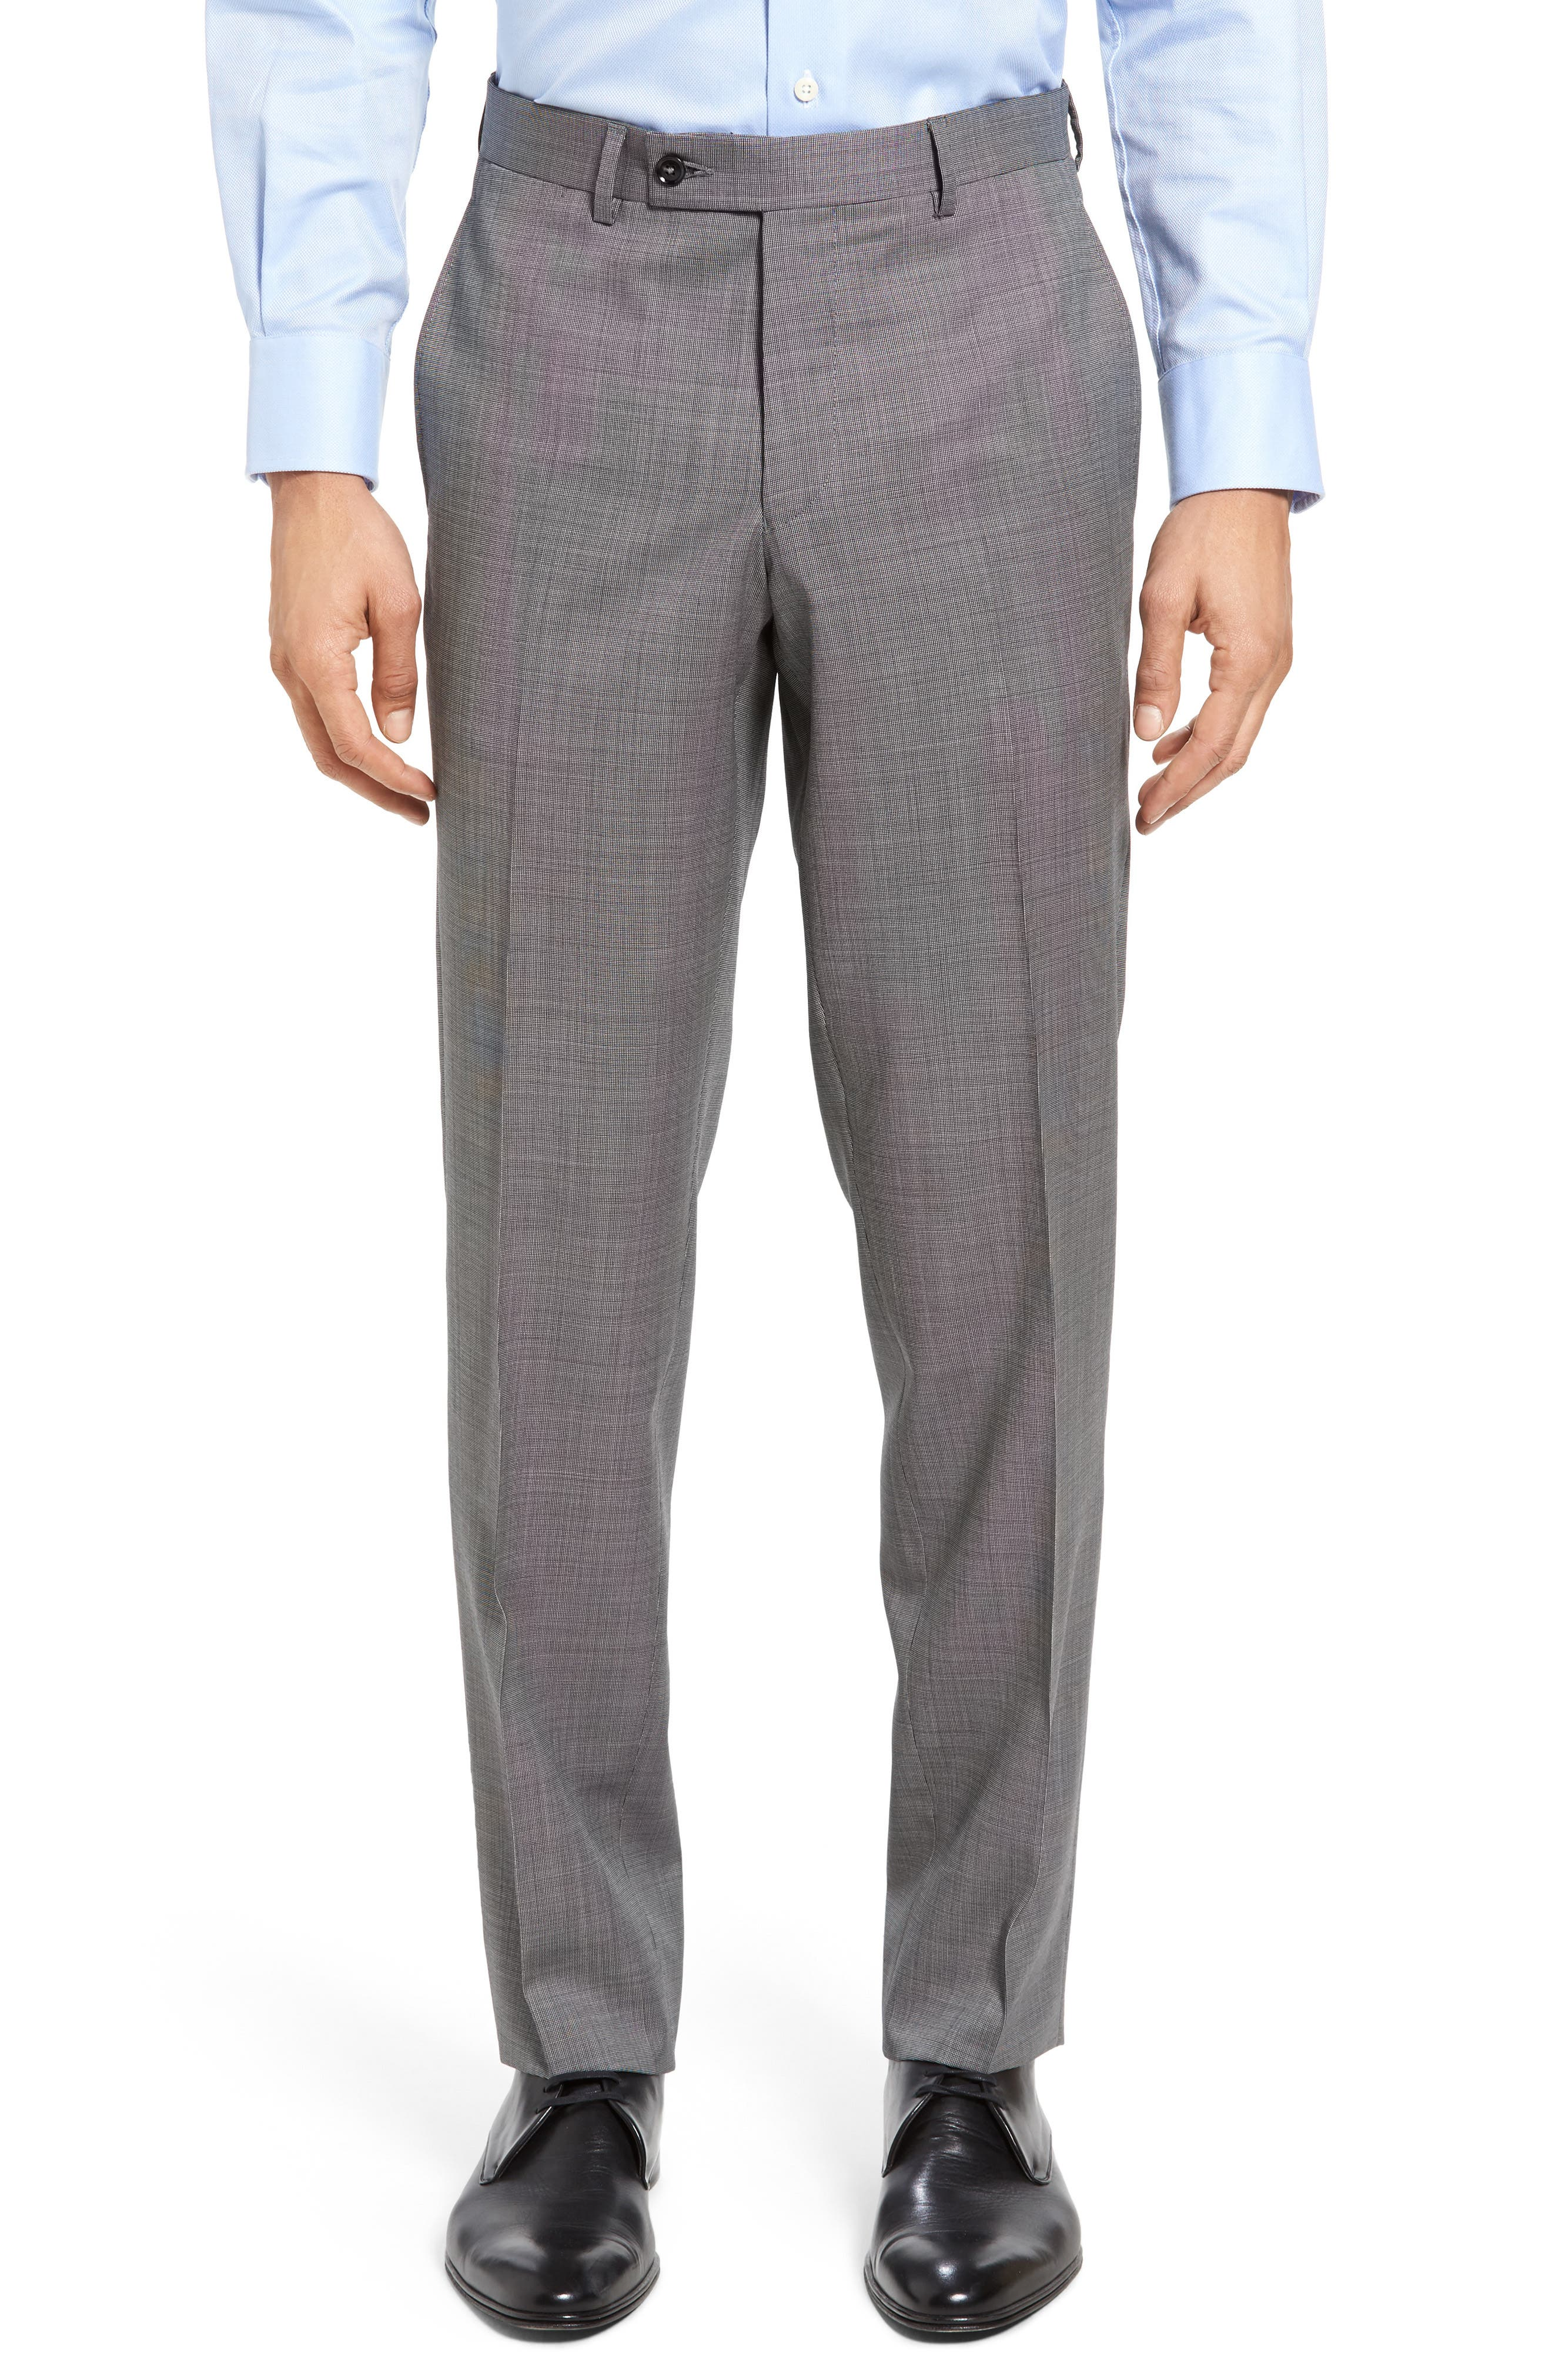 Jay Trim Fit Solid Wool Suit,                             Alternate thumbnail 11, color,                             LIGHT GREY